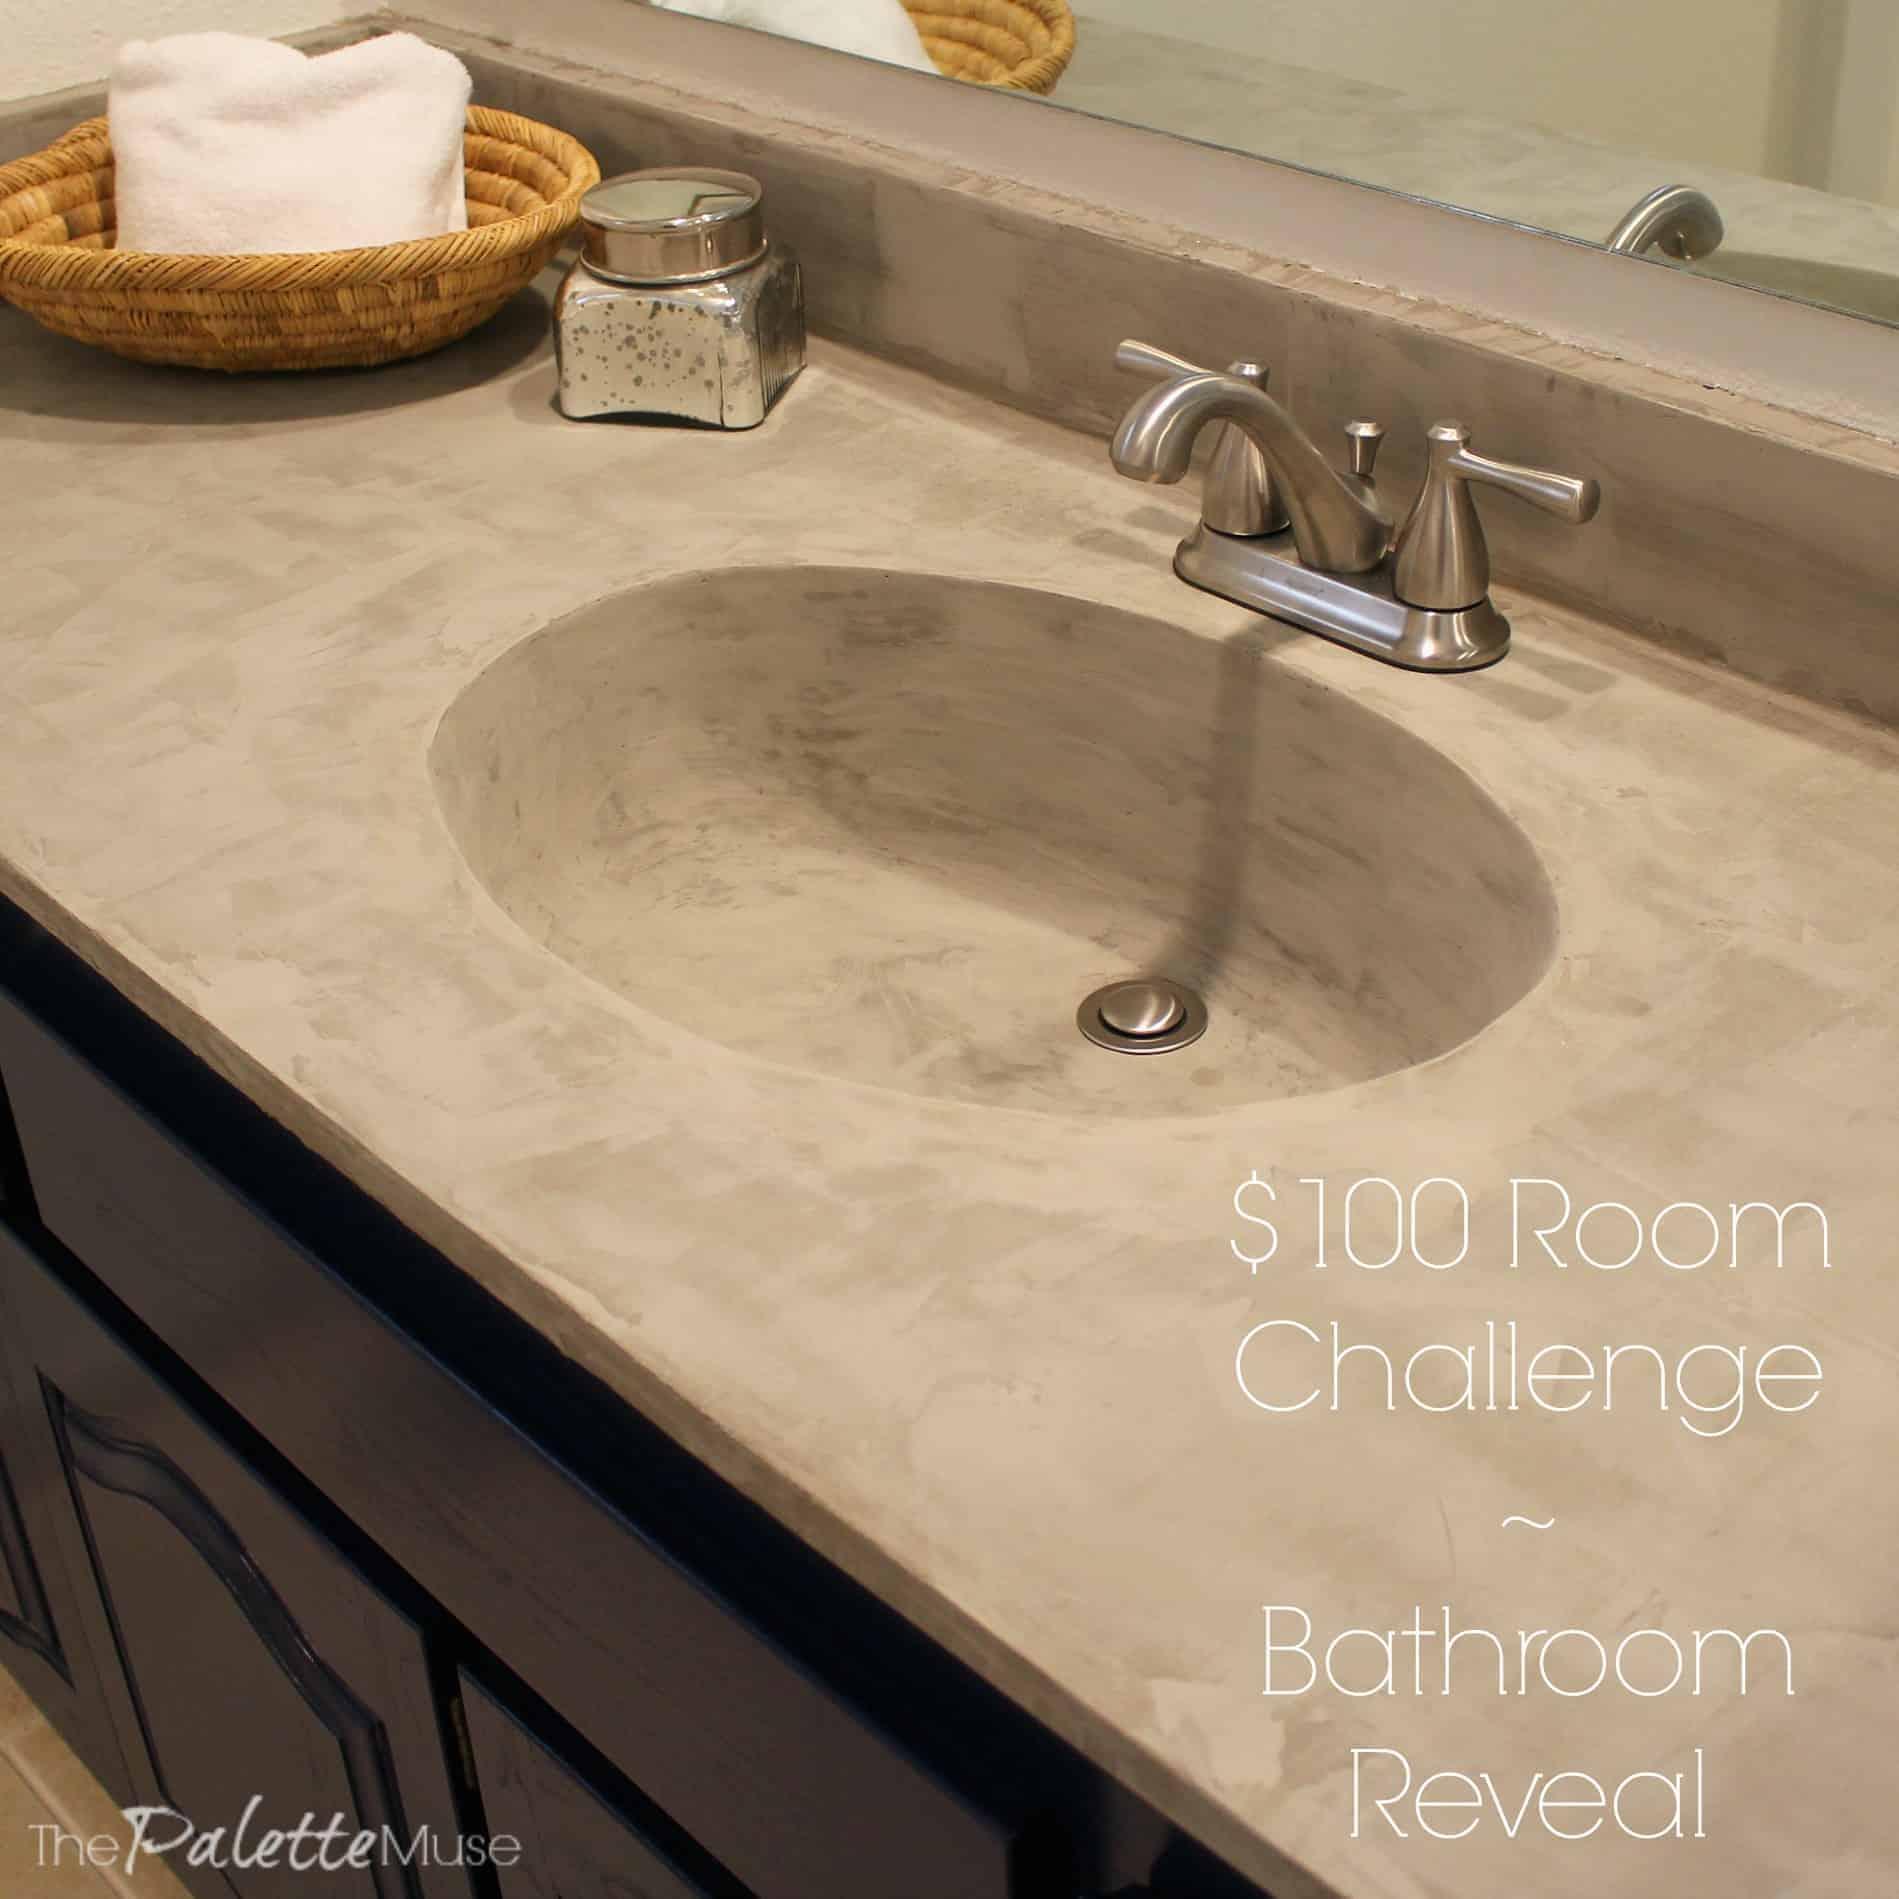 Laundry Room Color Palette: $100 Room Challenge Bathroom Reveal